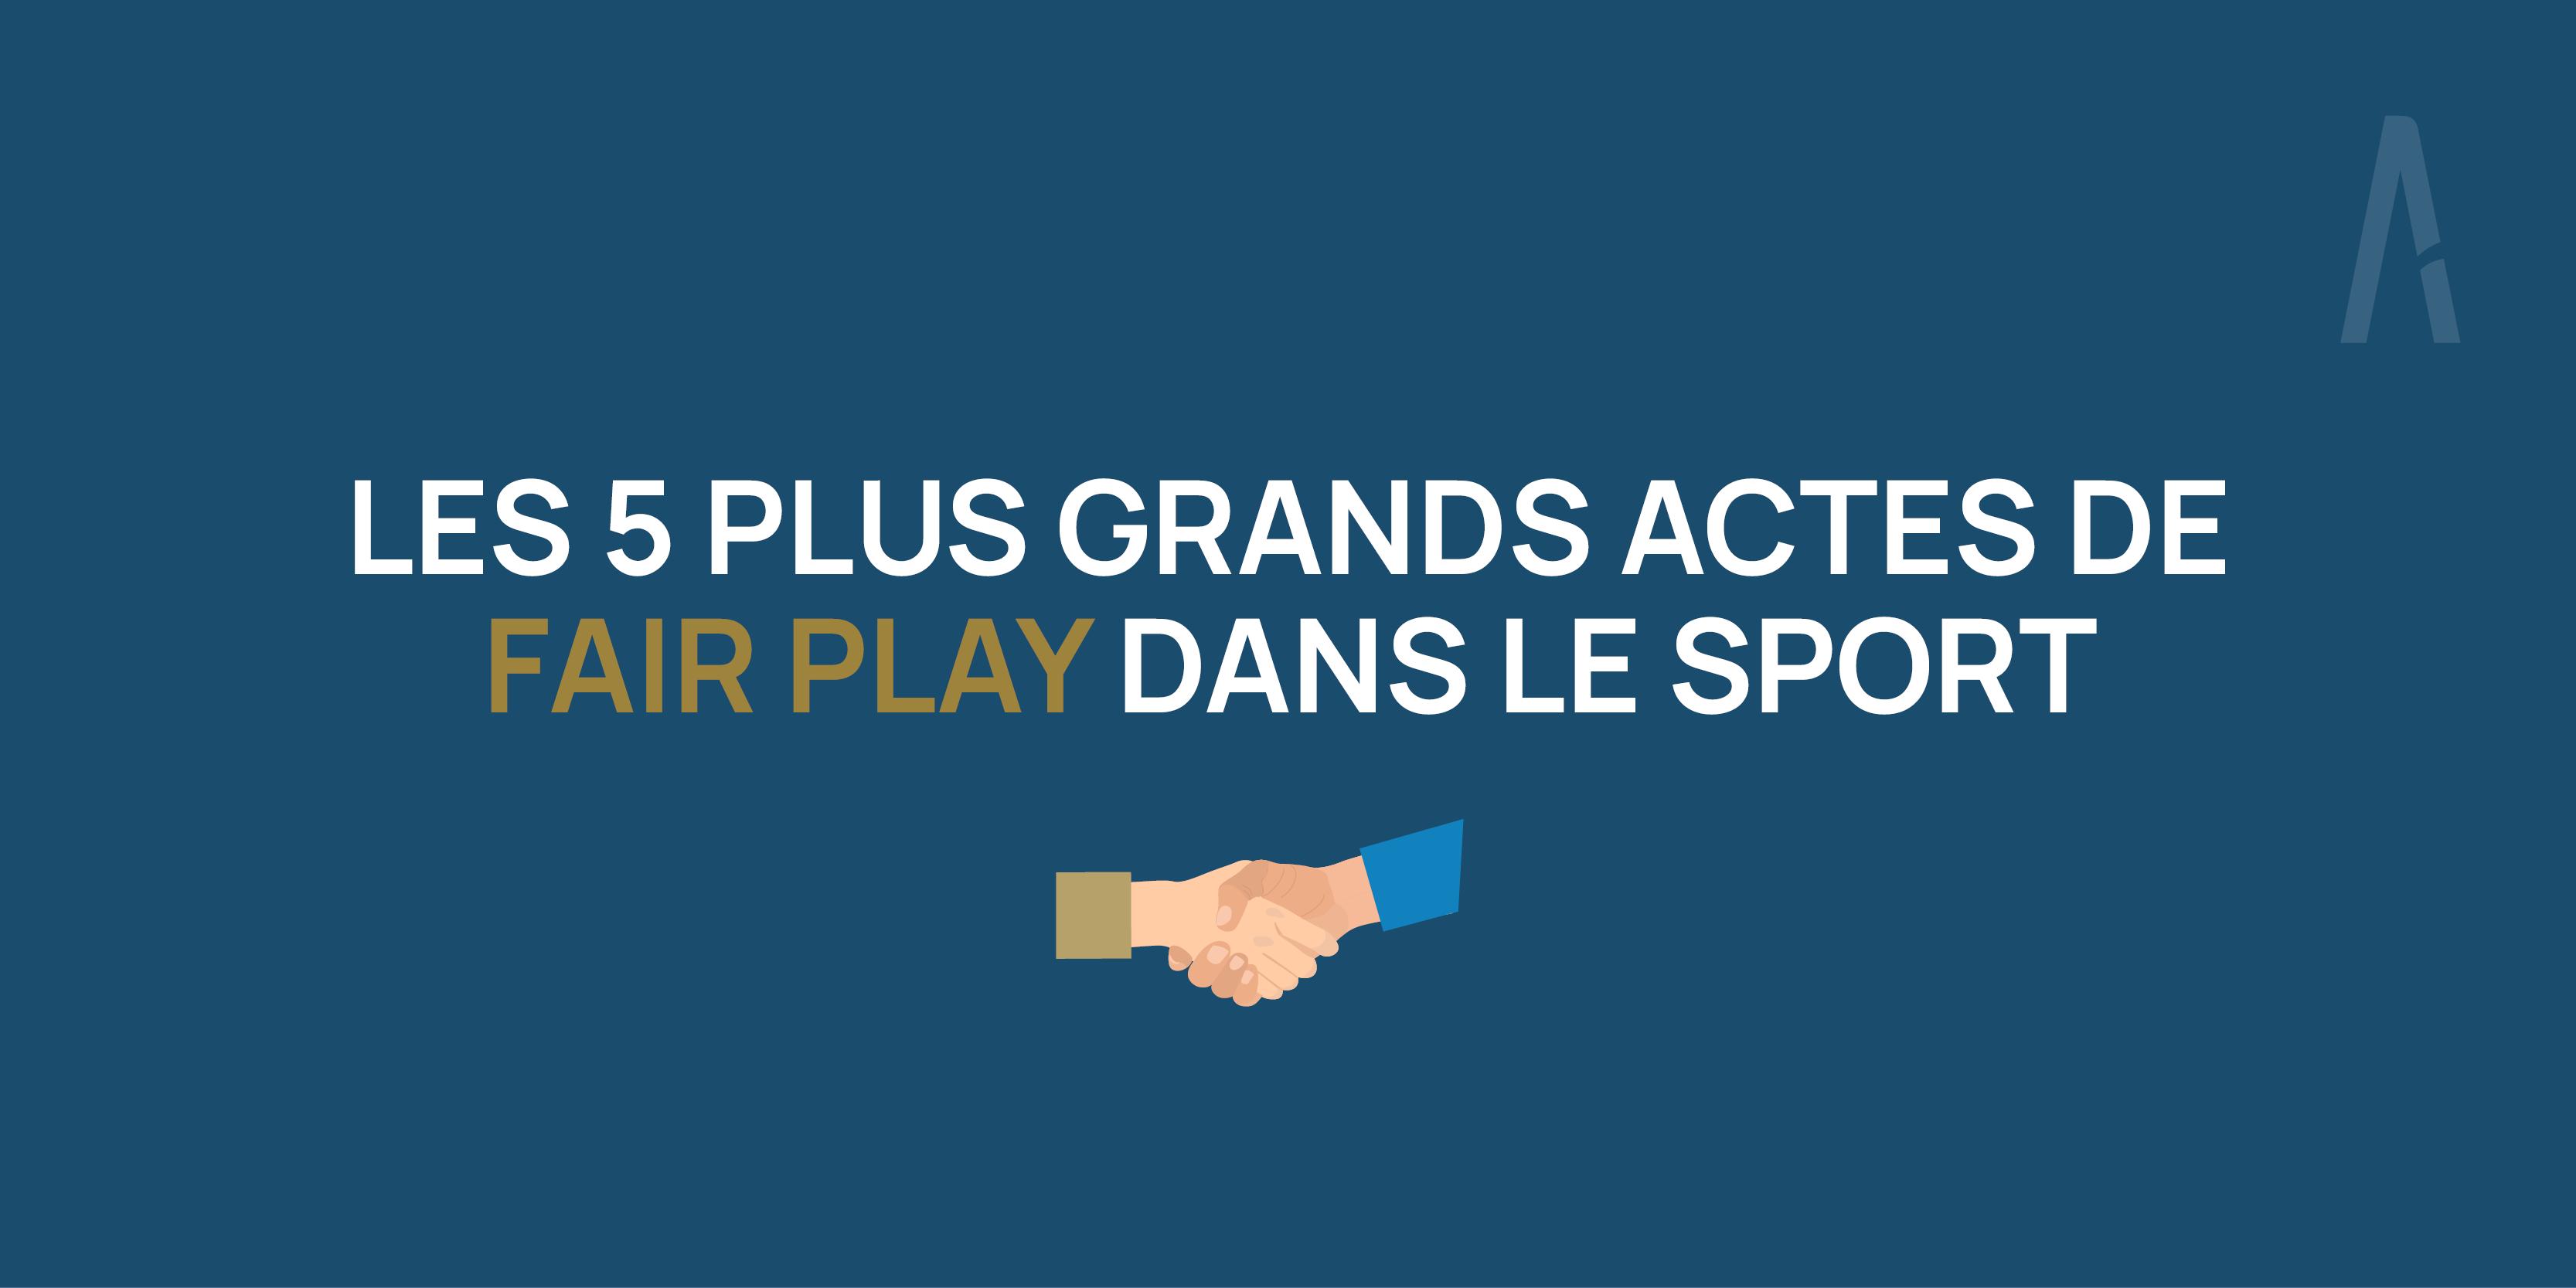 FAIR-PLAY : The greatest acts of fair play in sport